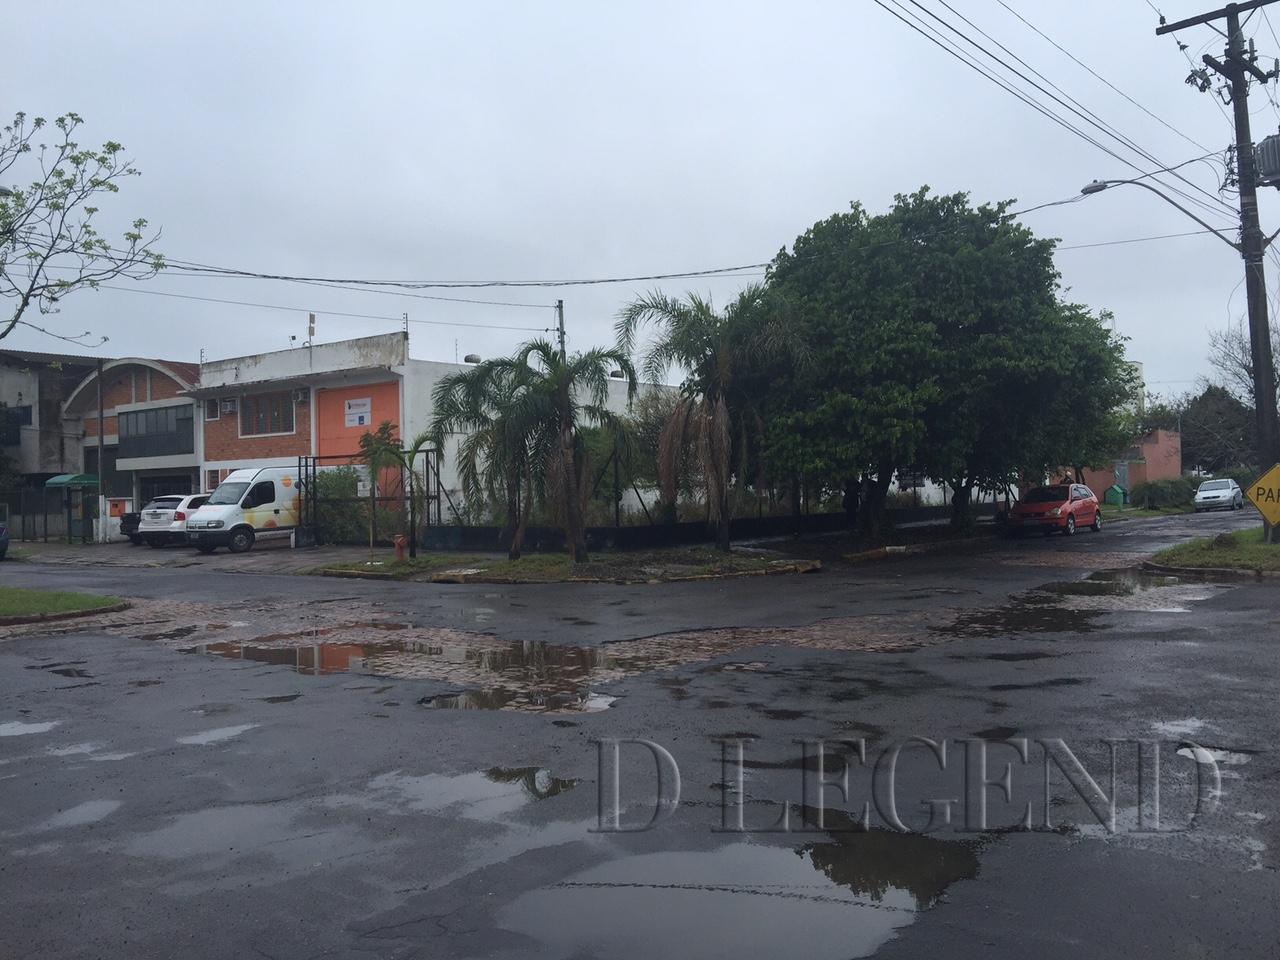 TERRENO P LOCAÇÃO - ANCHIETA - Avenida Jaime Vignoli, 09 - Anchieta - Porto Alegre